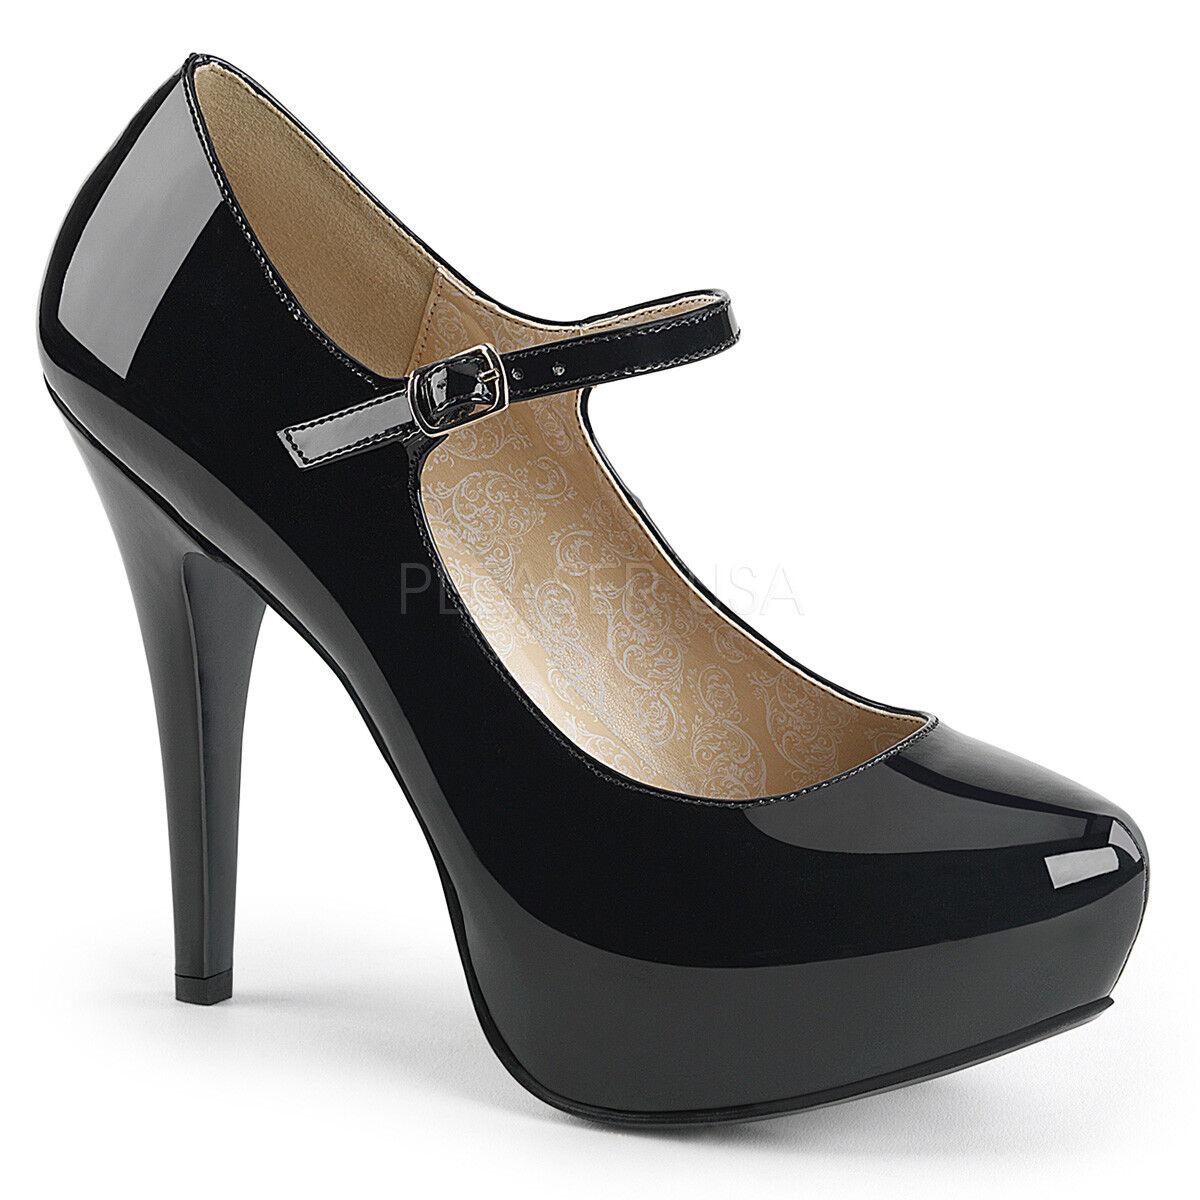 Pleaser Chloe - 02 02 02 Negro Patente MARYJANE PLATAFORMA OCULTA ZAPATOS Reino Unido 9 EU 42 in (approx. 106.68 cm) Stock  80% de descuento